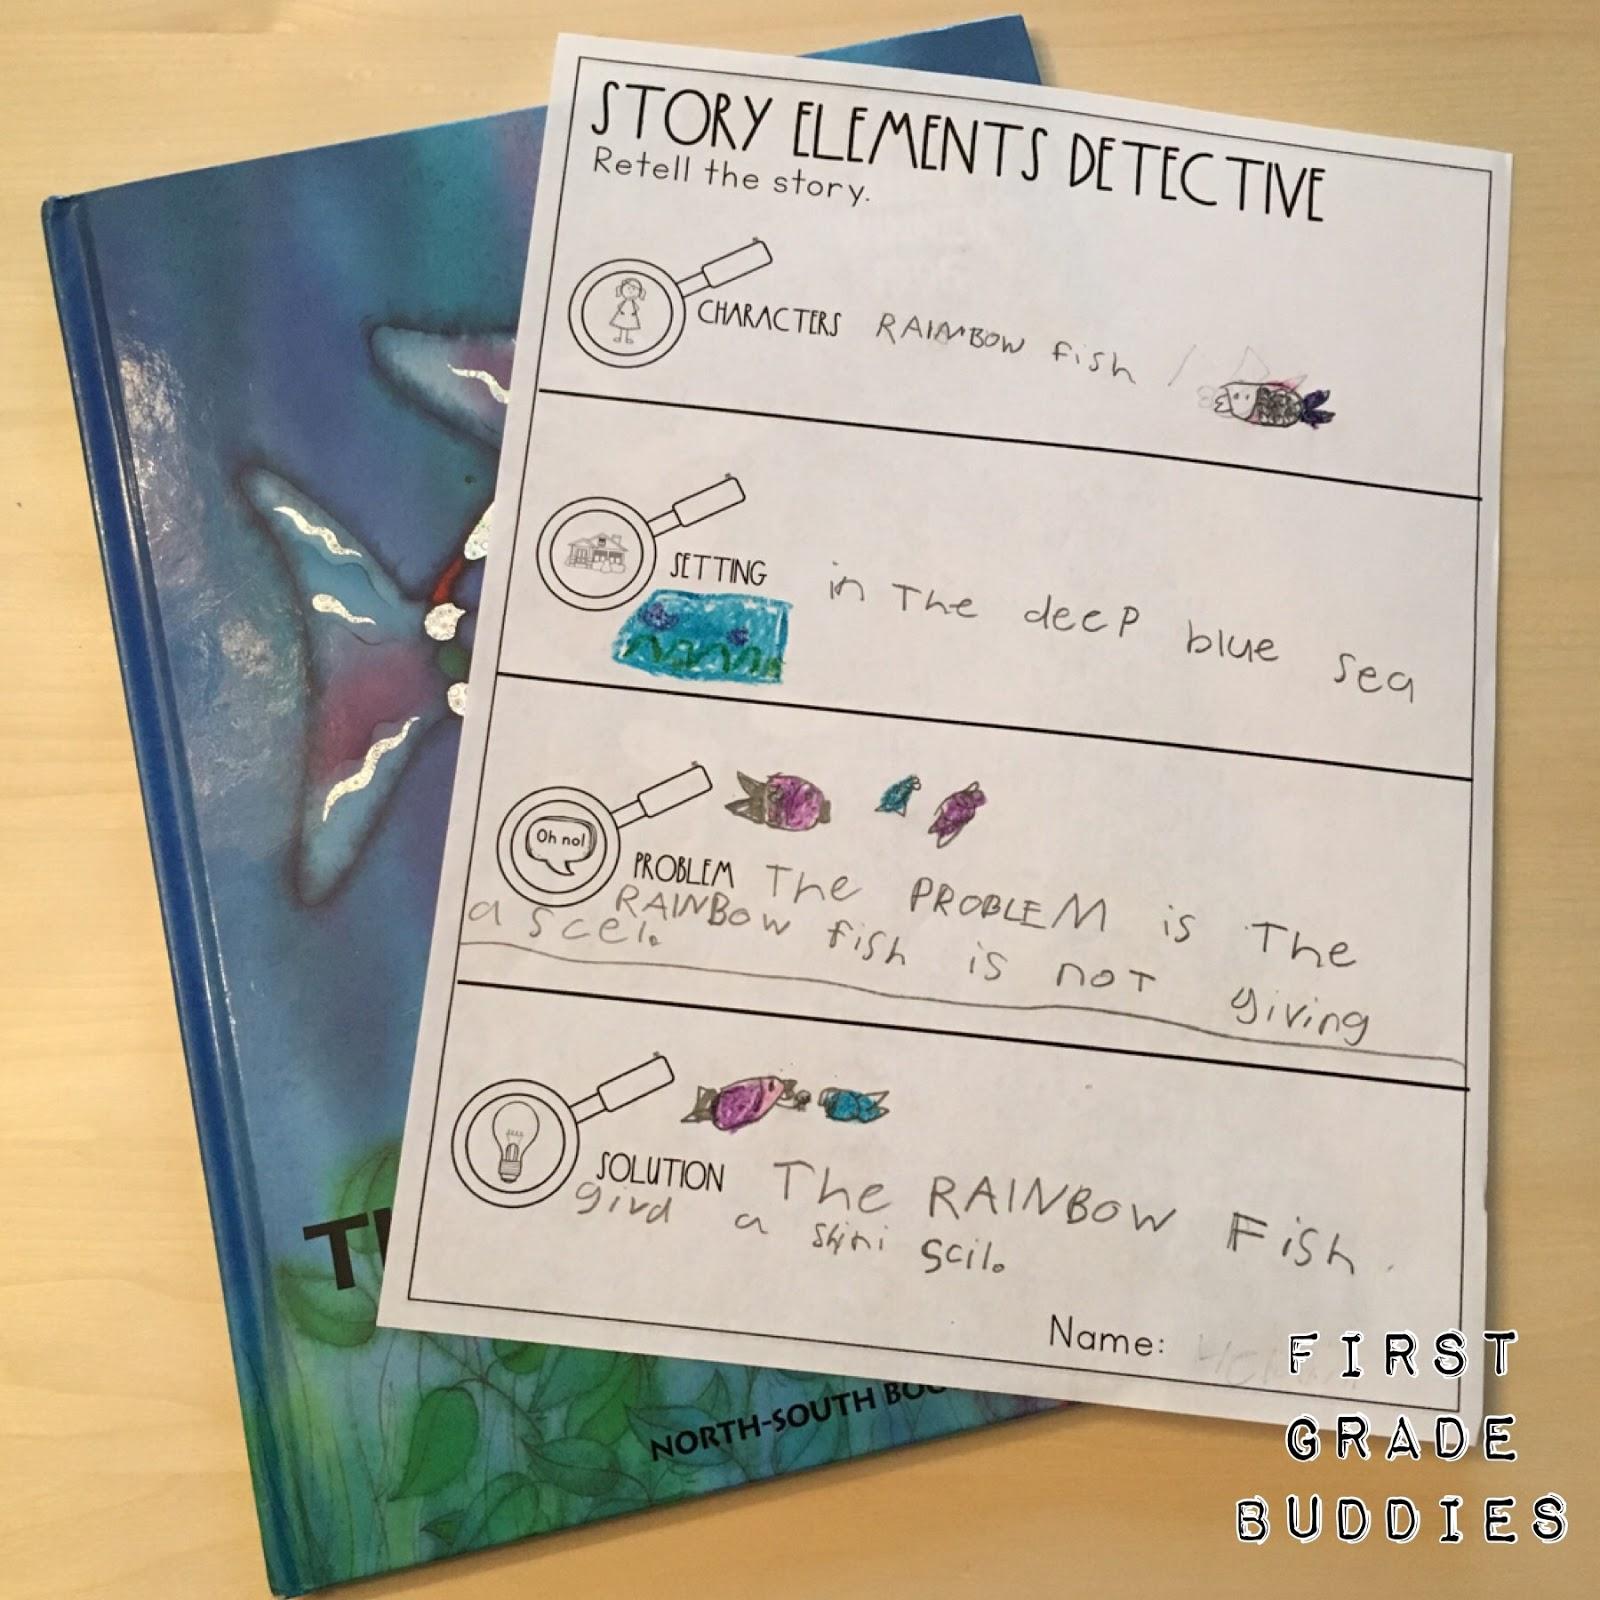 medium resolution of Story Elements Detective   First Grade Buddies